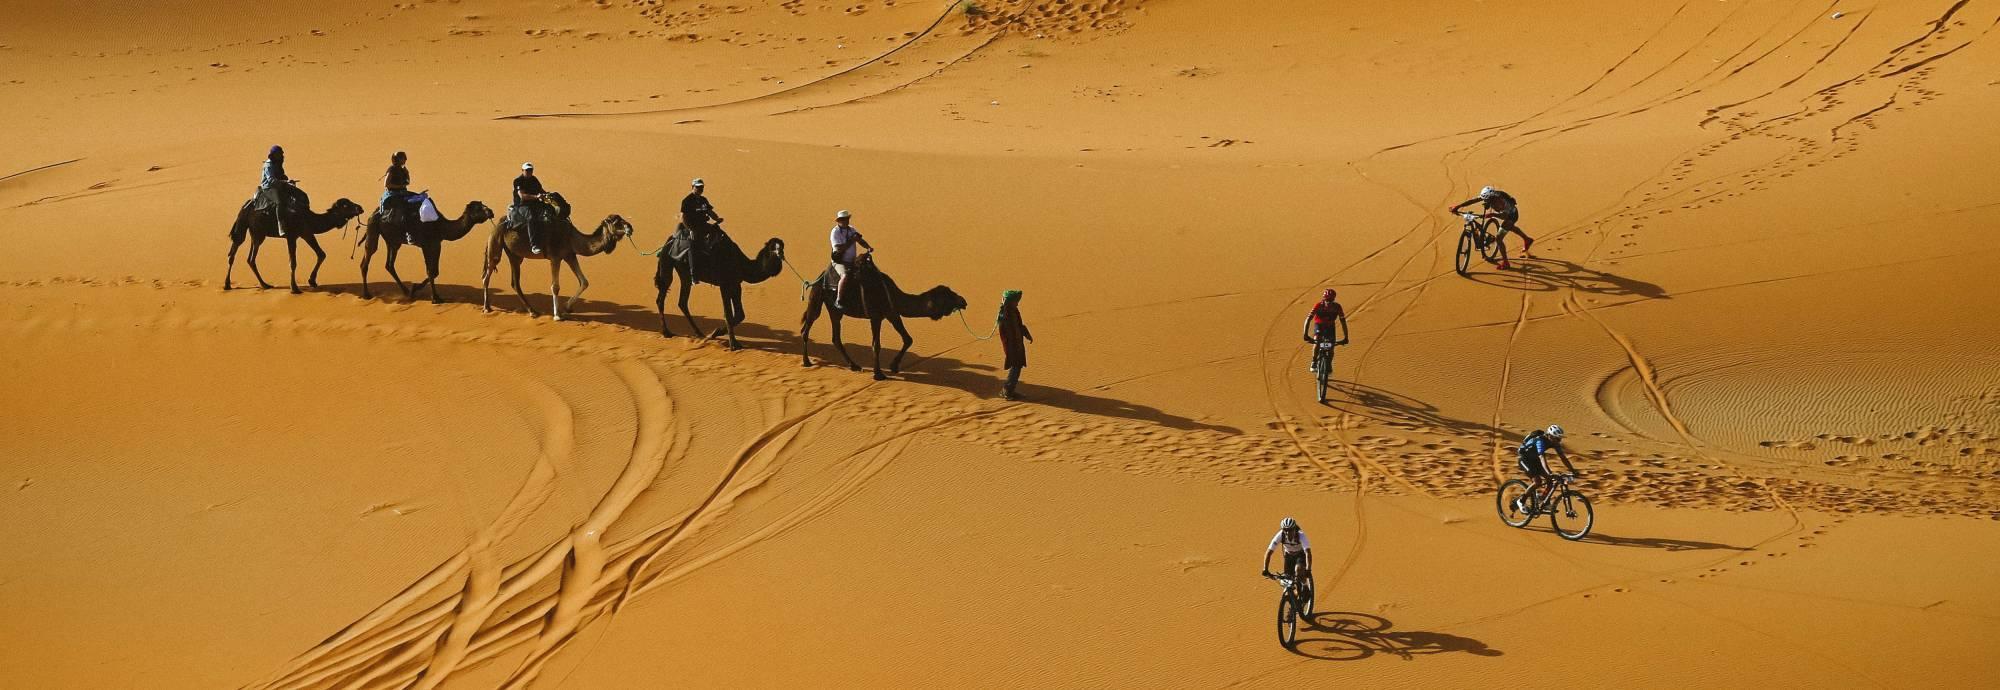 Header: Morocco